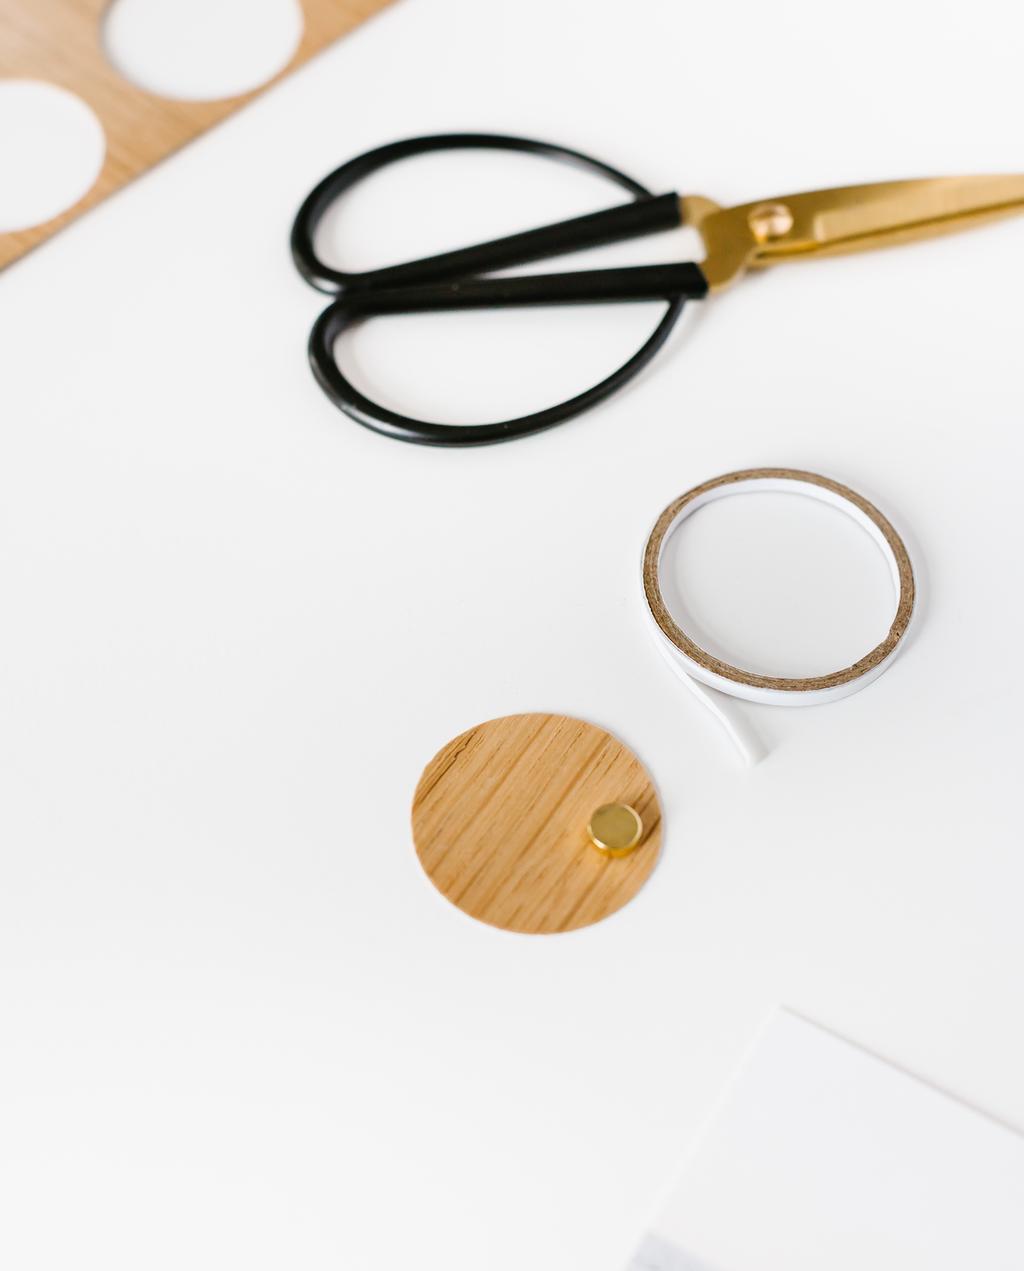 vtwonen 08-2020 | DIY small magic wall & magneten